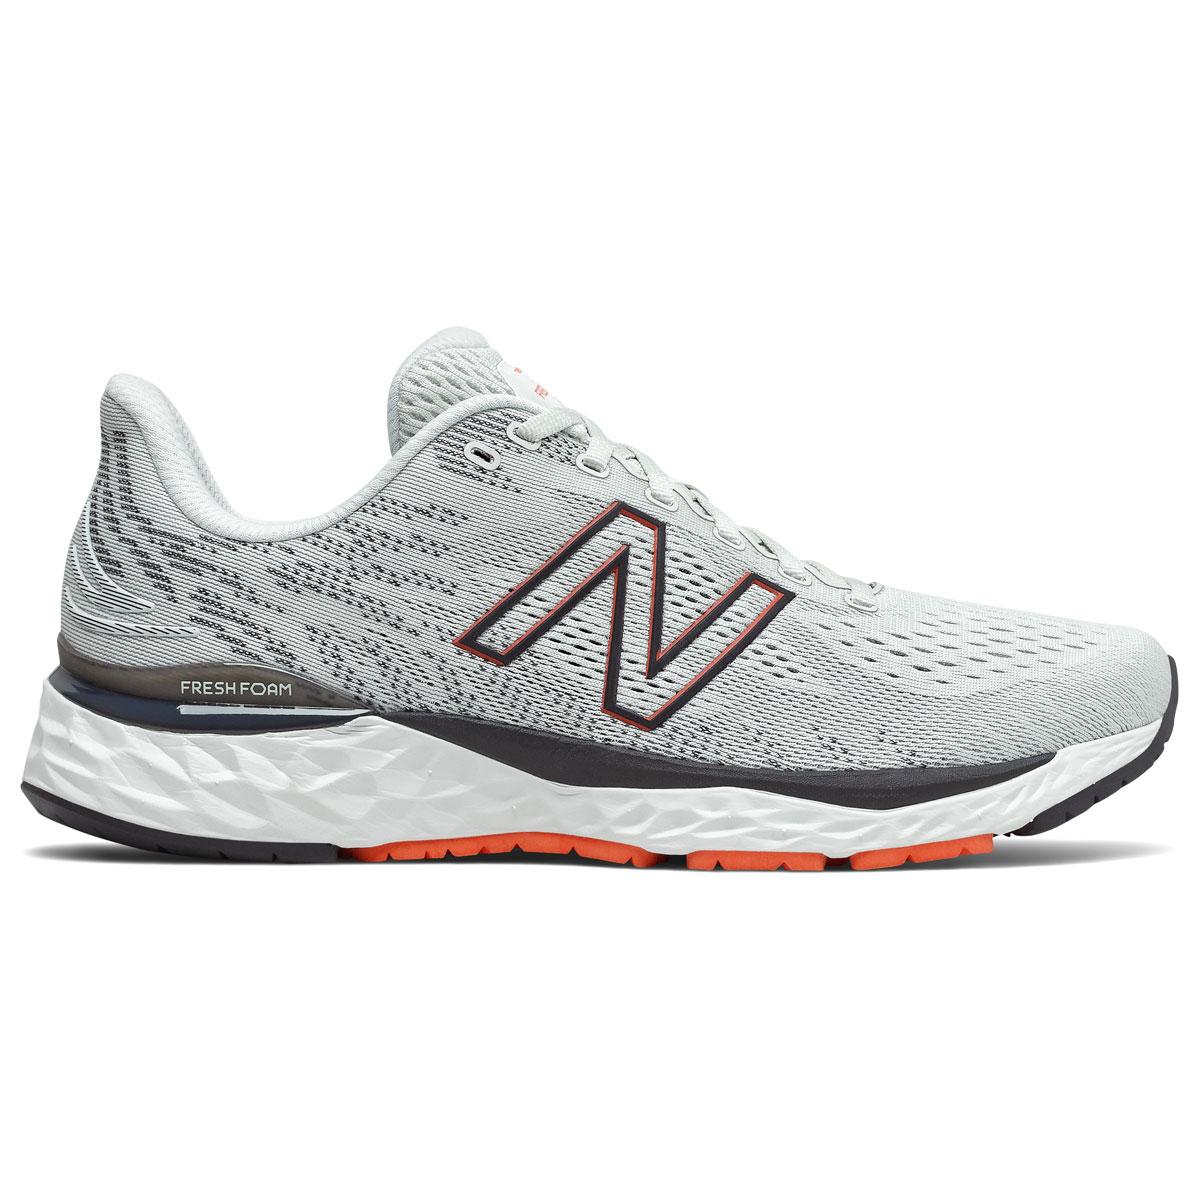 Men's New Balance Fresh Foam 880v11 Running Shoe - Color: Arrowroot/Ghost Pepper - Size: 7 - Width: Wide, Arrowroot/Ghost Pepper, large, image 1